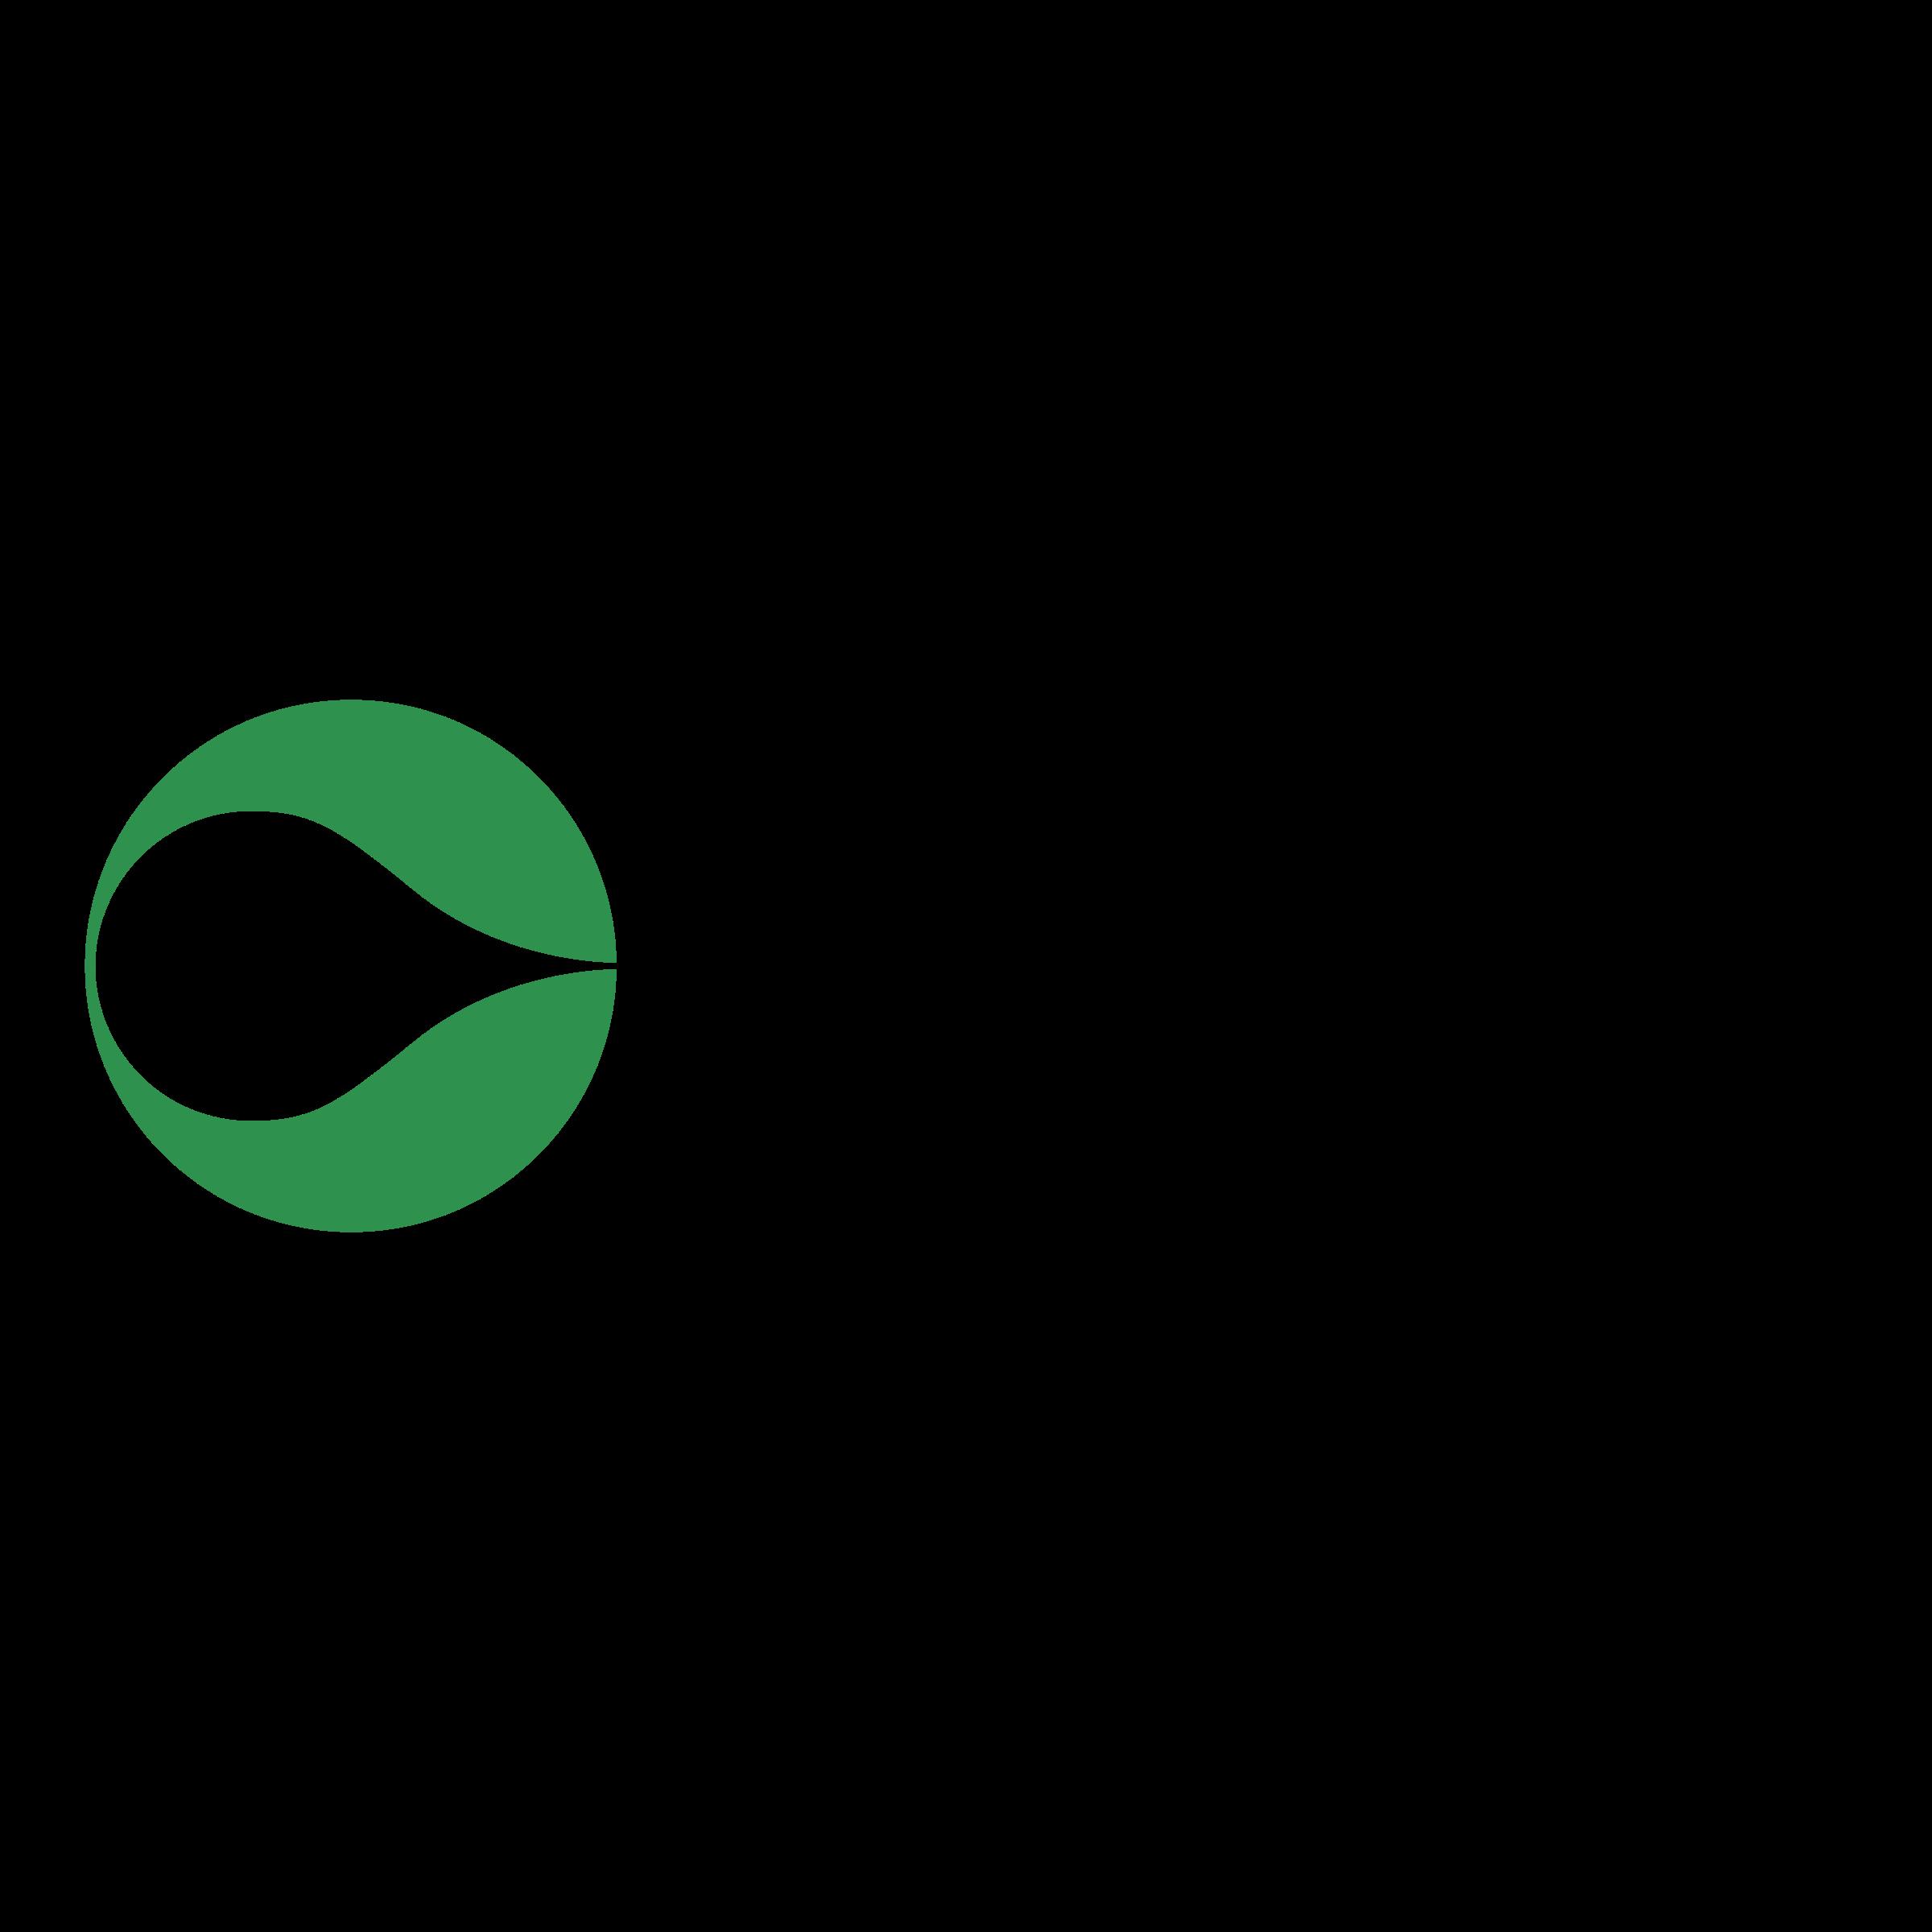 Cargill 4583 Logo PNG Transparent